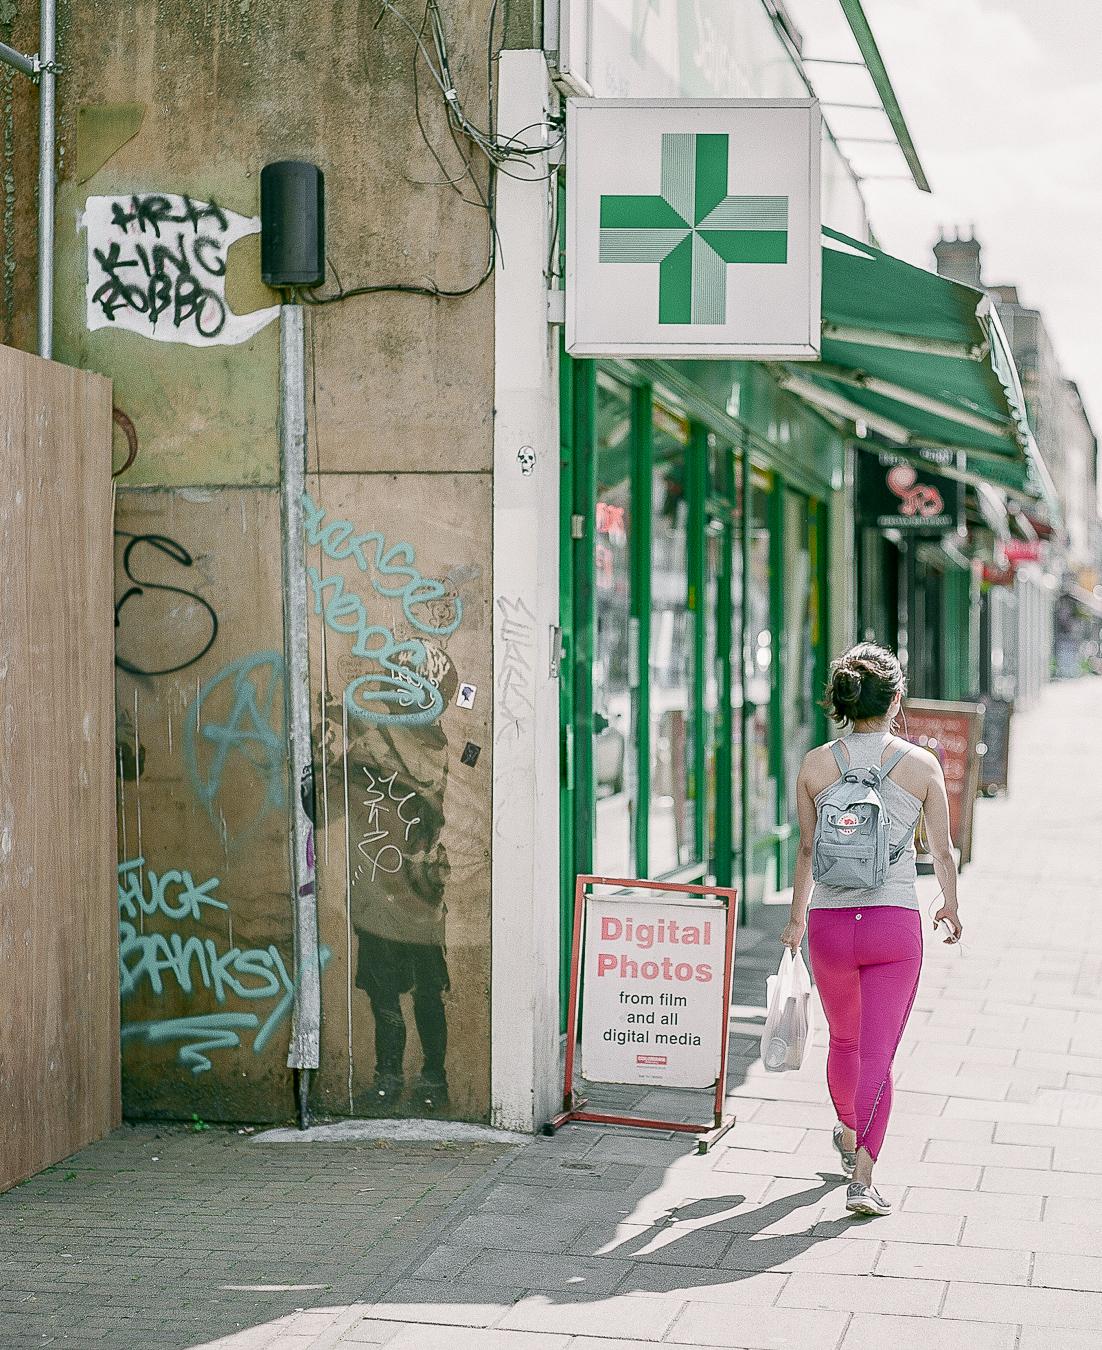 Banksy's 'Very Little Helps' - ARTVISIT